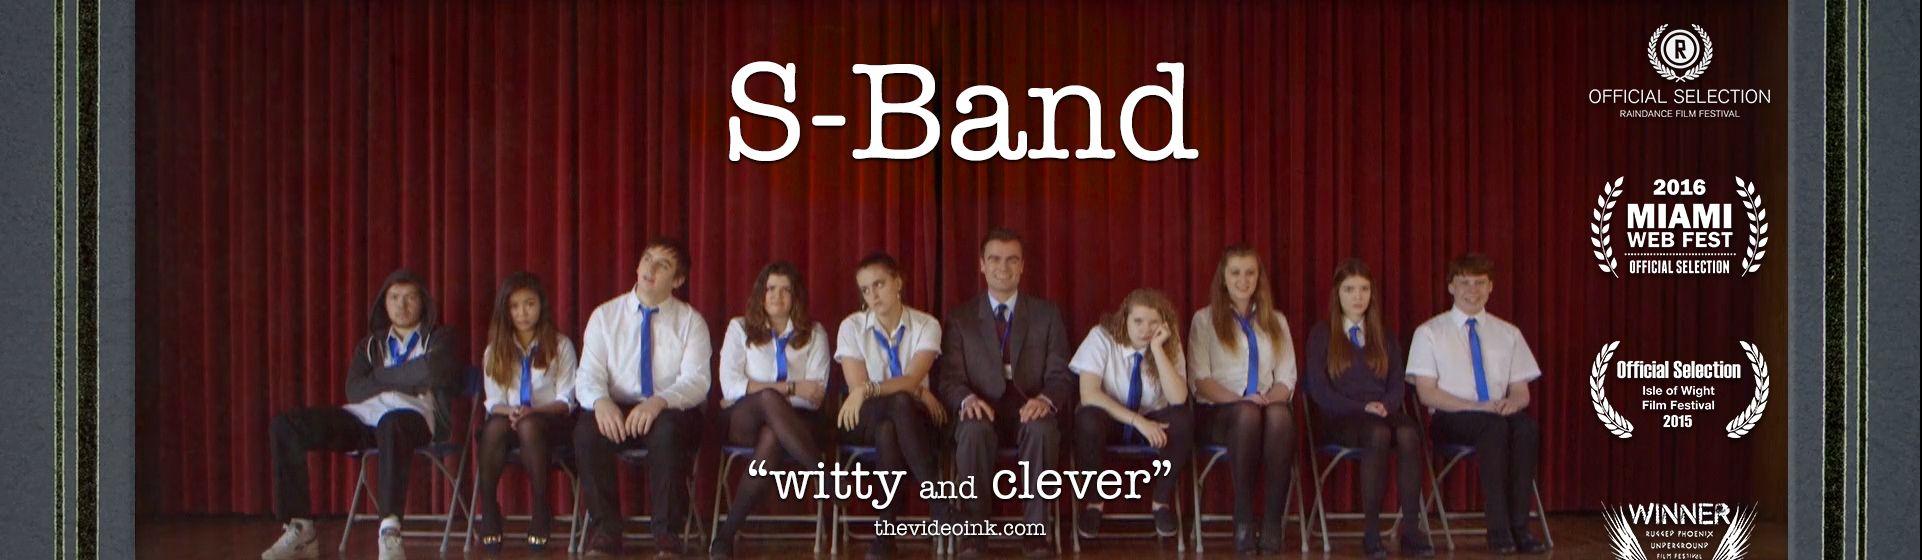 S-Band Trailer